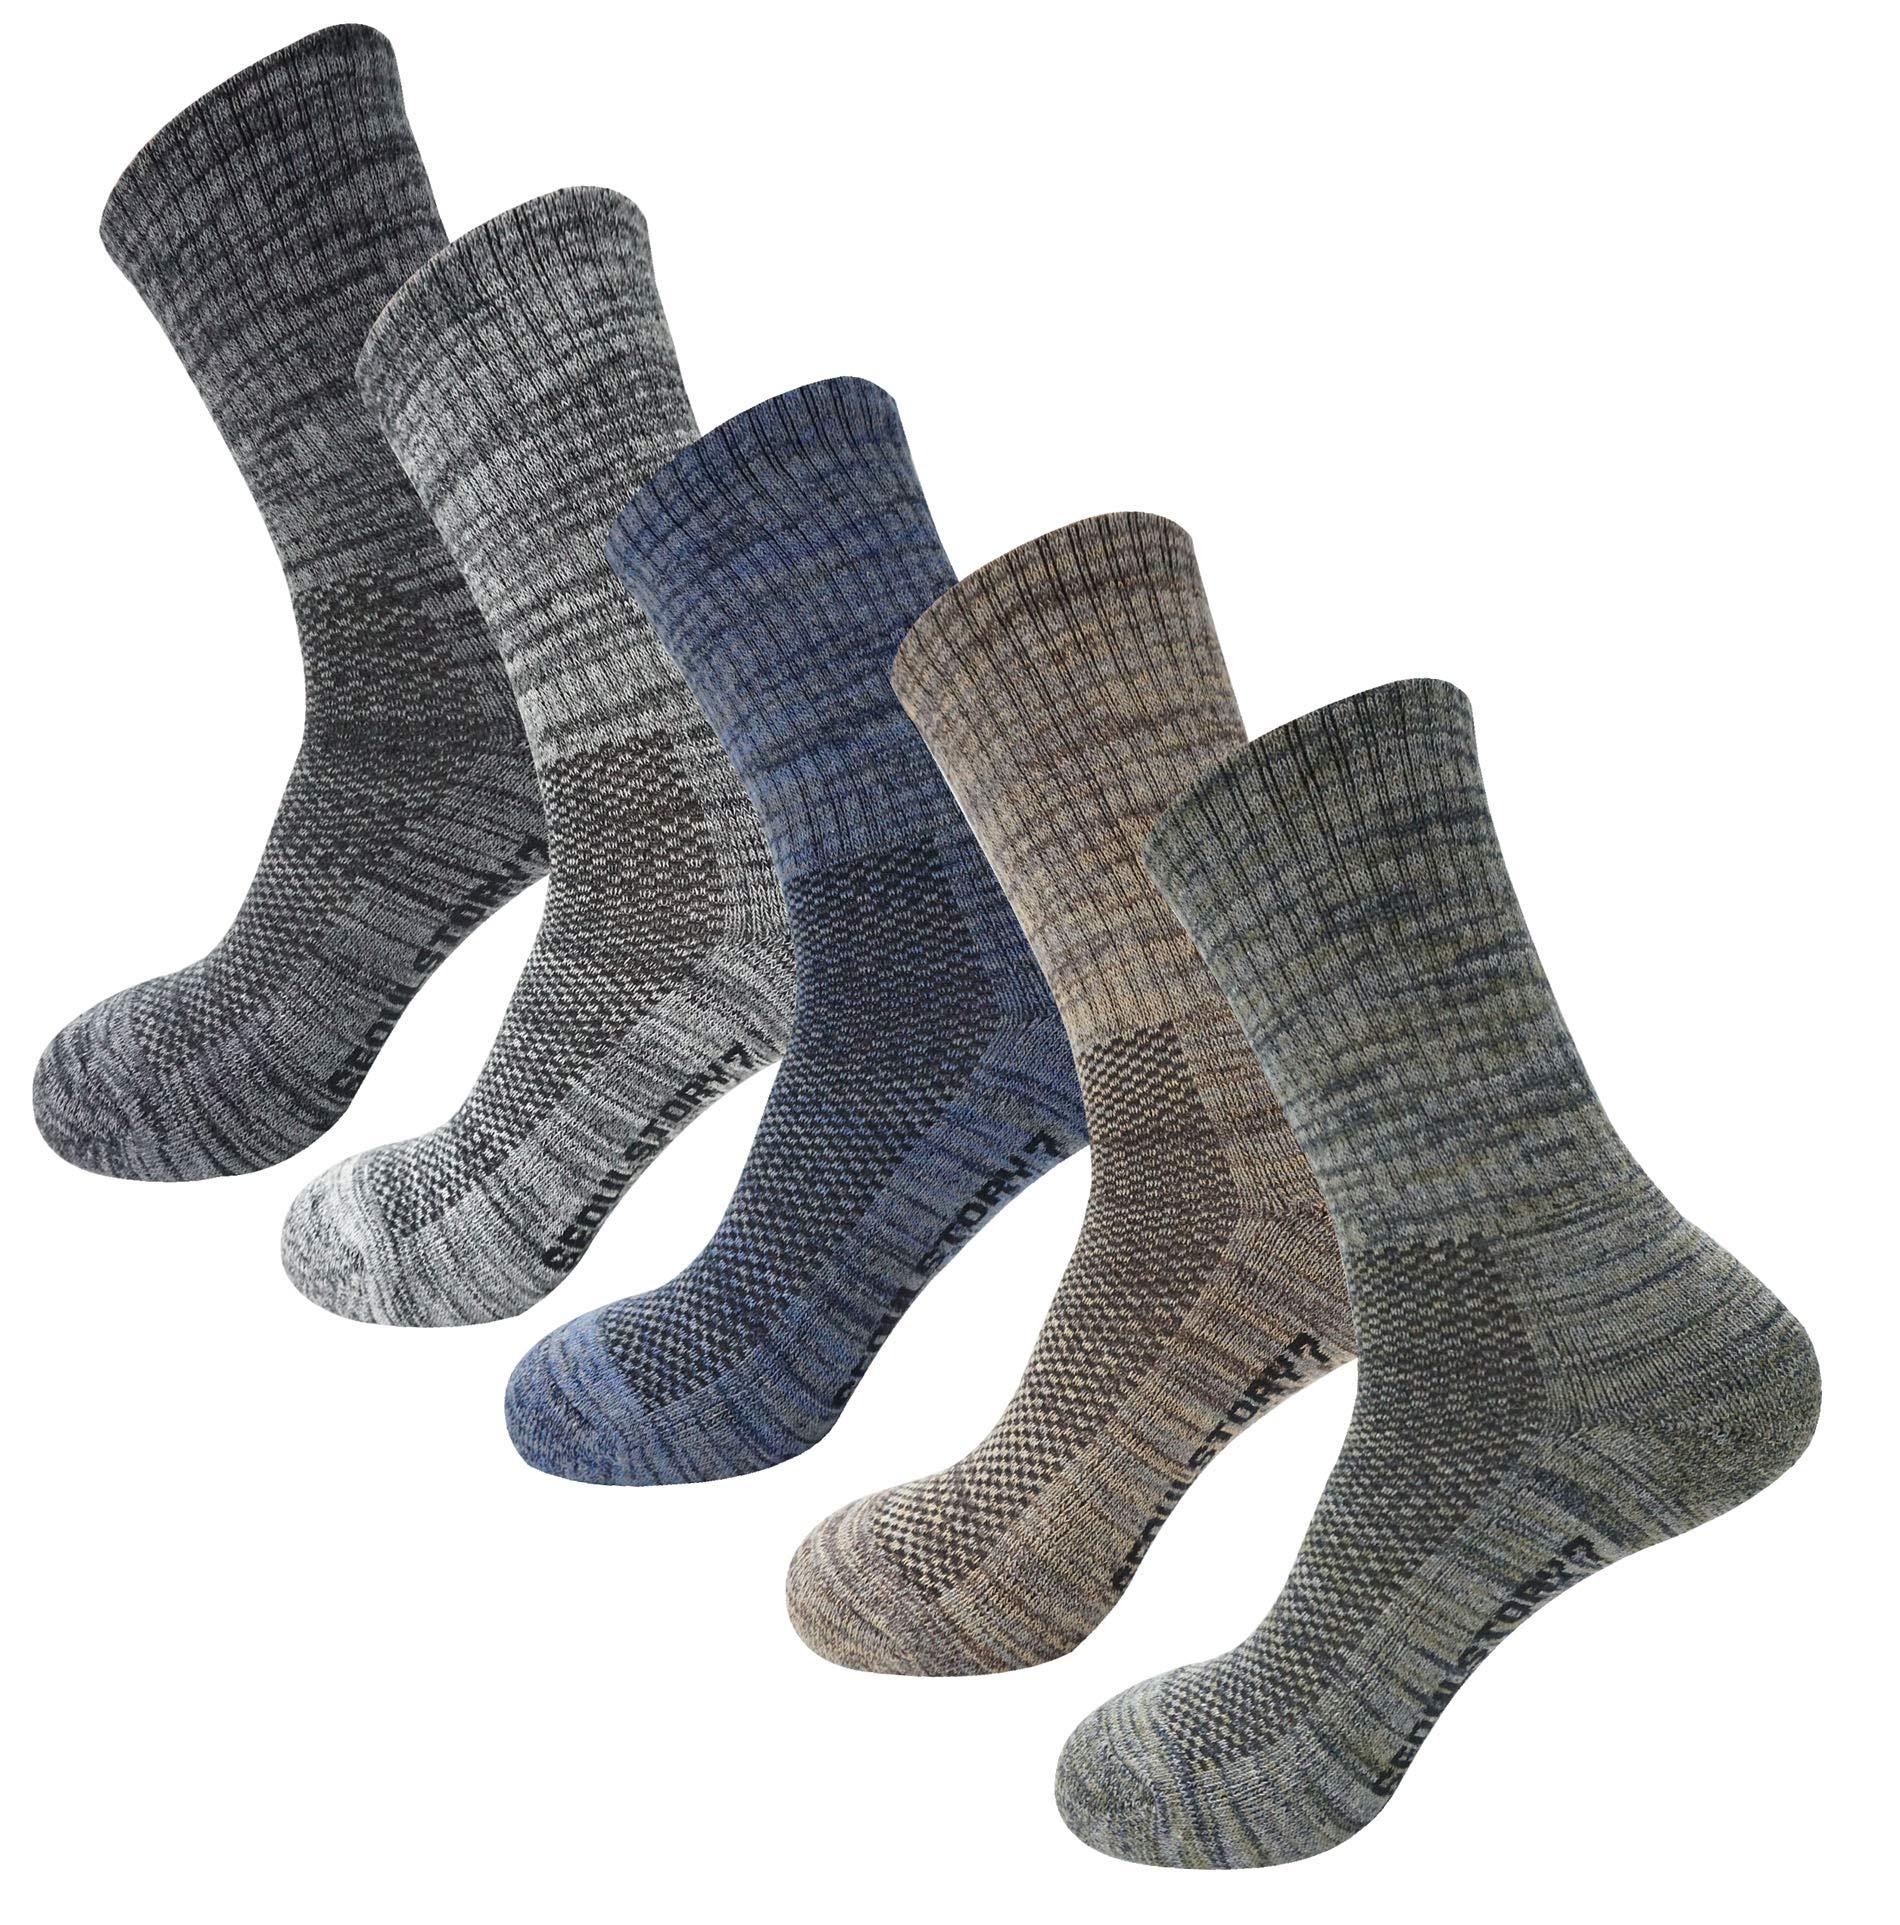 SEOULSTORY7 5Pack Women's Multi Performance Padded Hiking/Outdoor Crew Socks Black/Gray/Blue/Brown/Khaki Medium by SEOULSTORY7